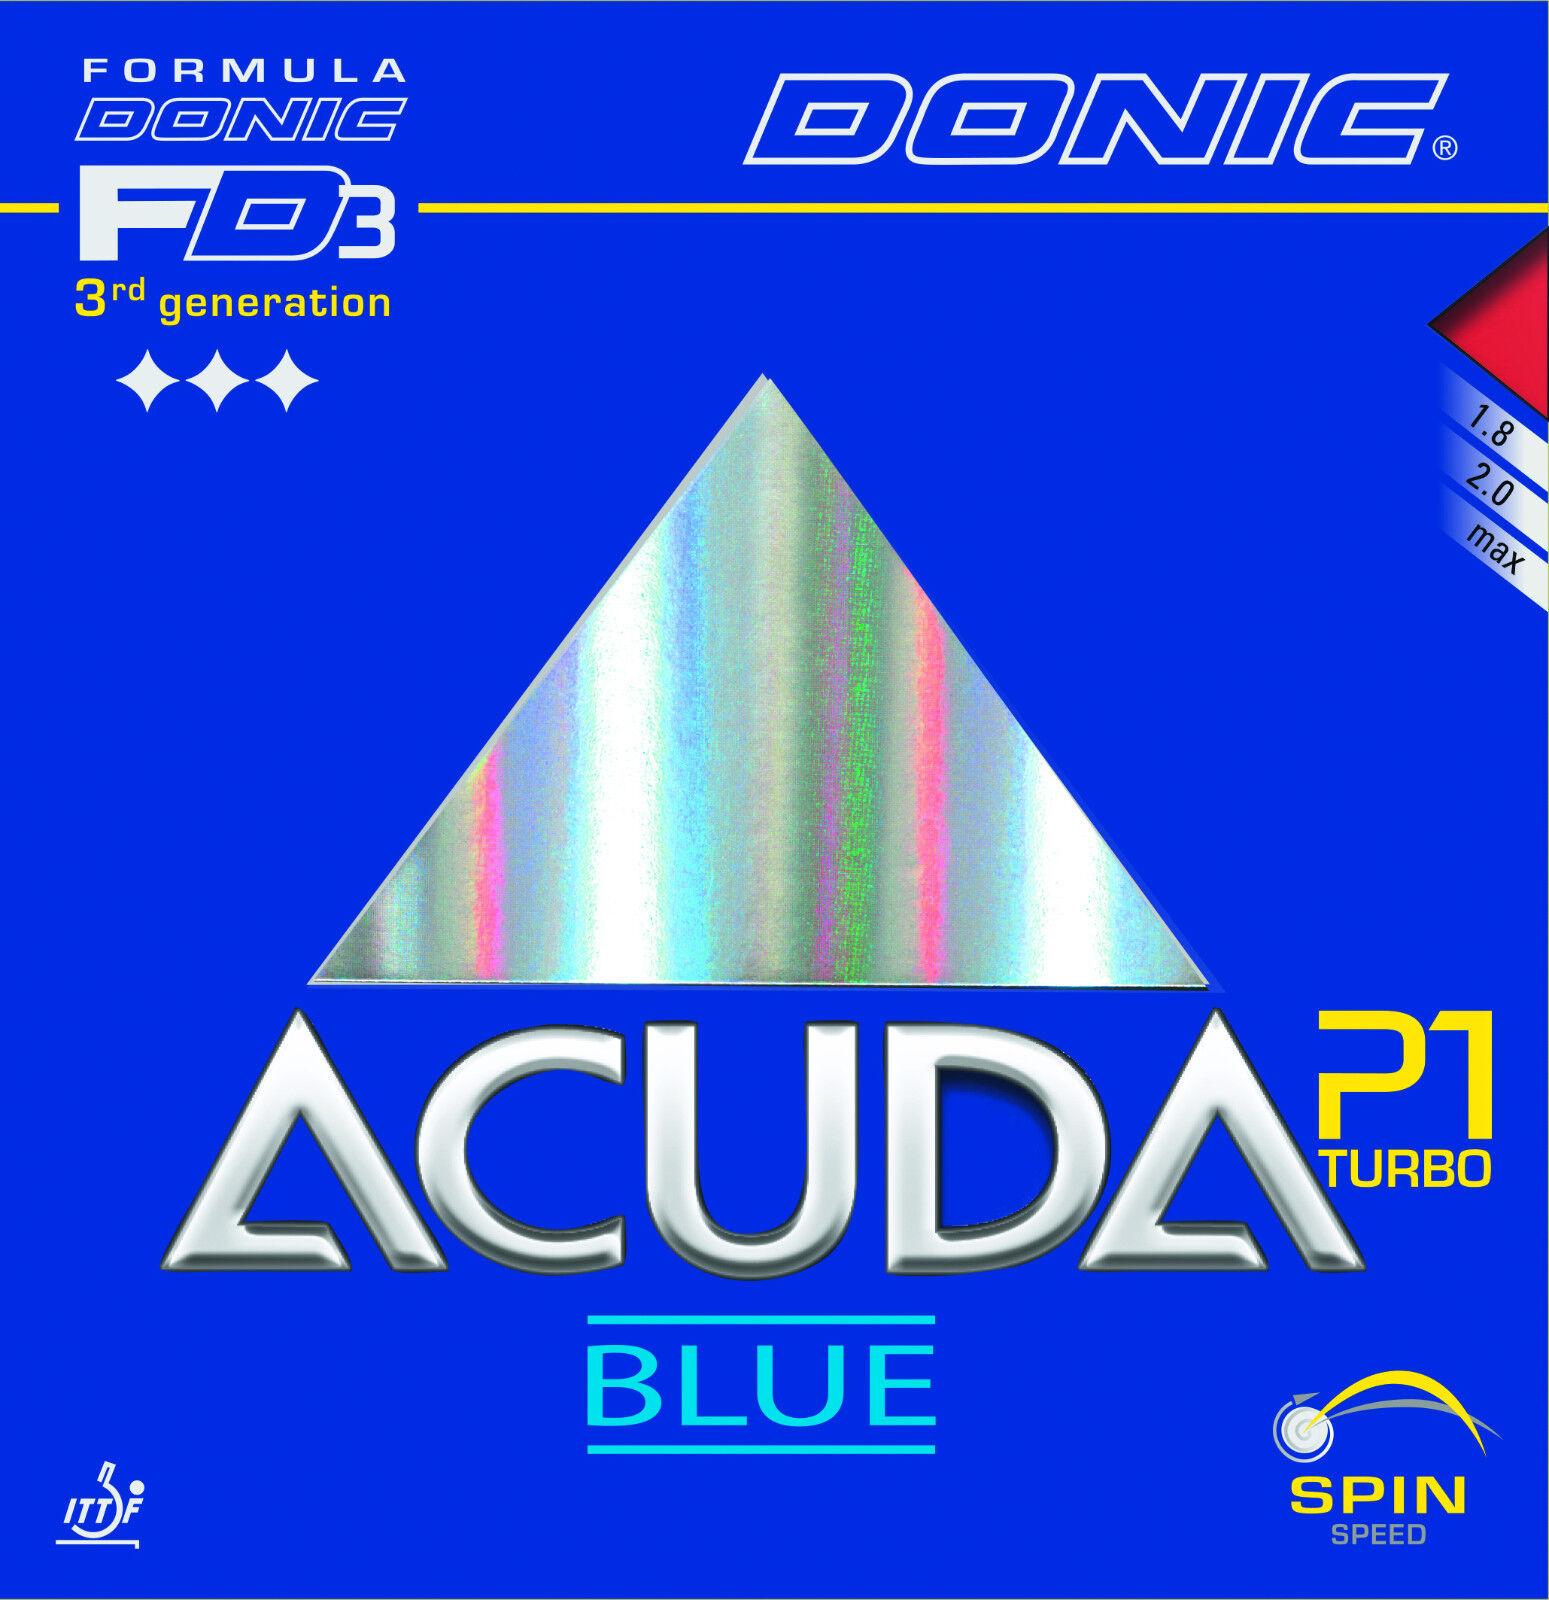 Donic Acuda Blau P1 Turbo Turbo Turbo cff081